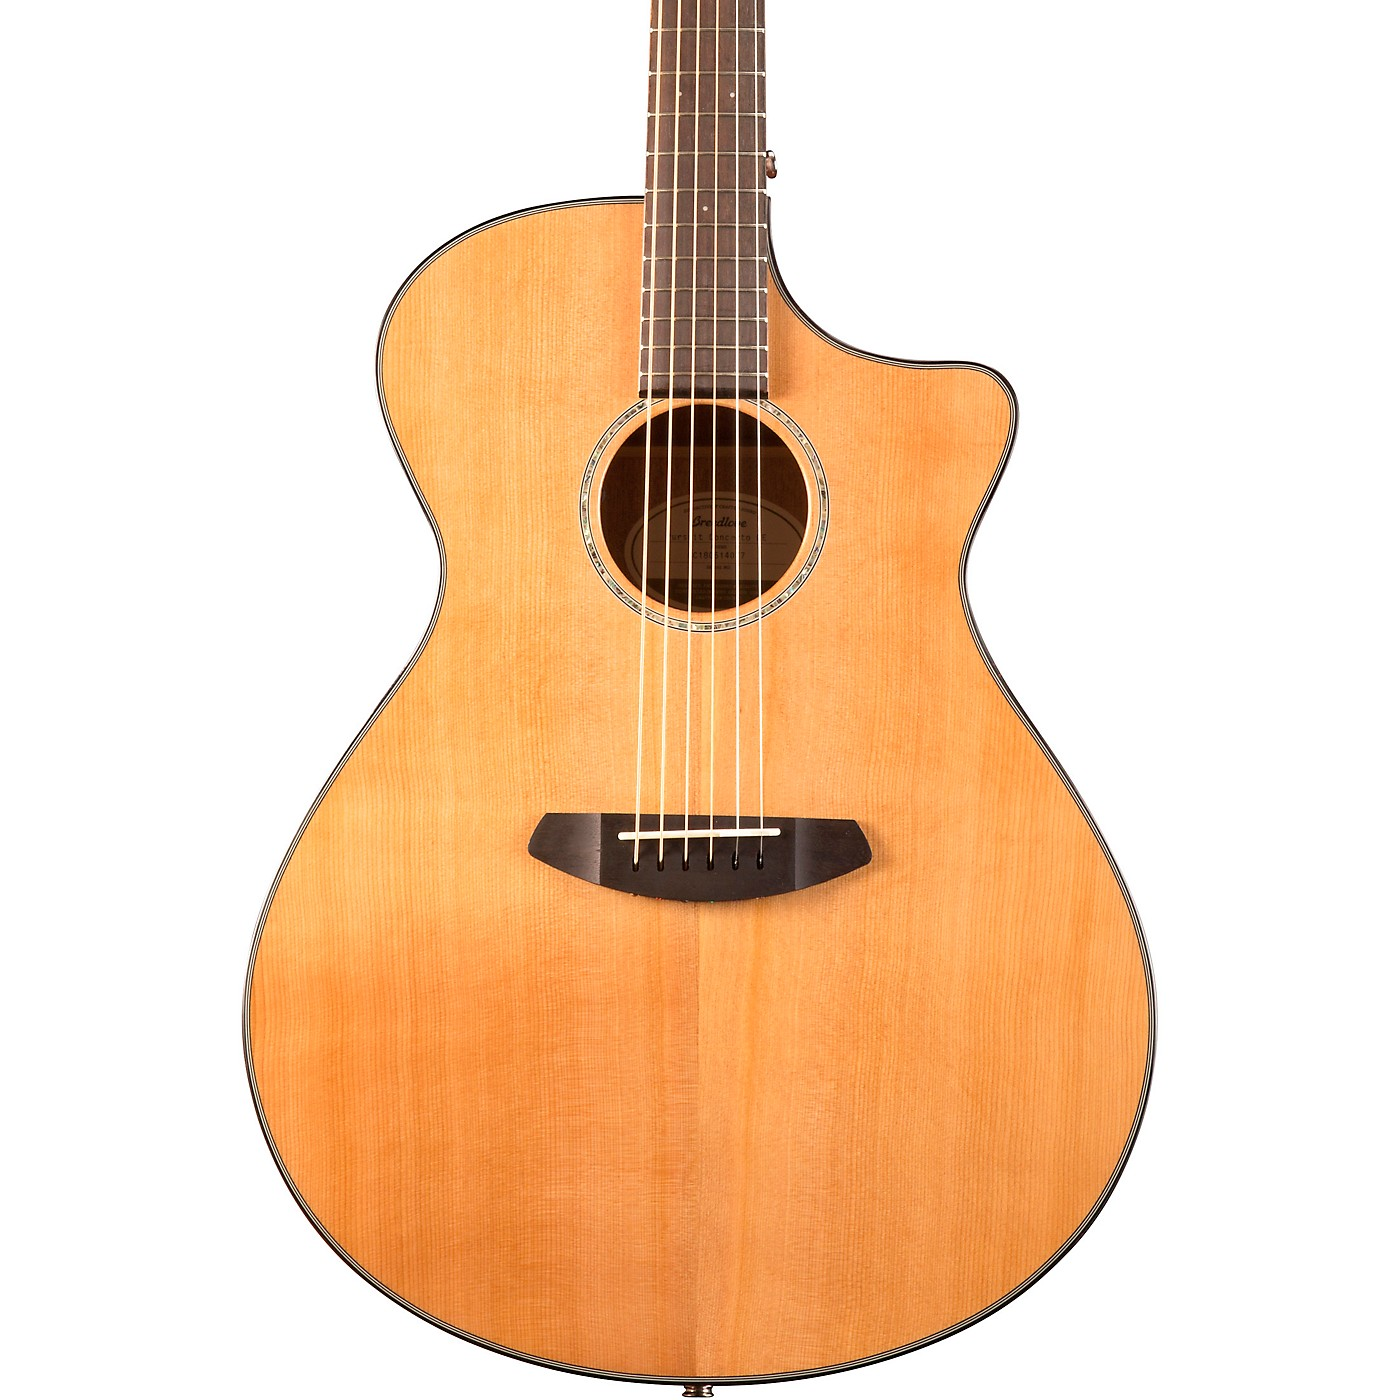 Breedlove Pursuit Concerto Cutaway CE Acoustic-Electric Guitar thumbnail